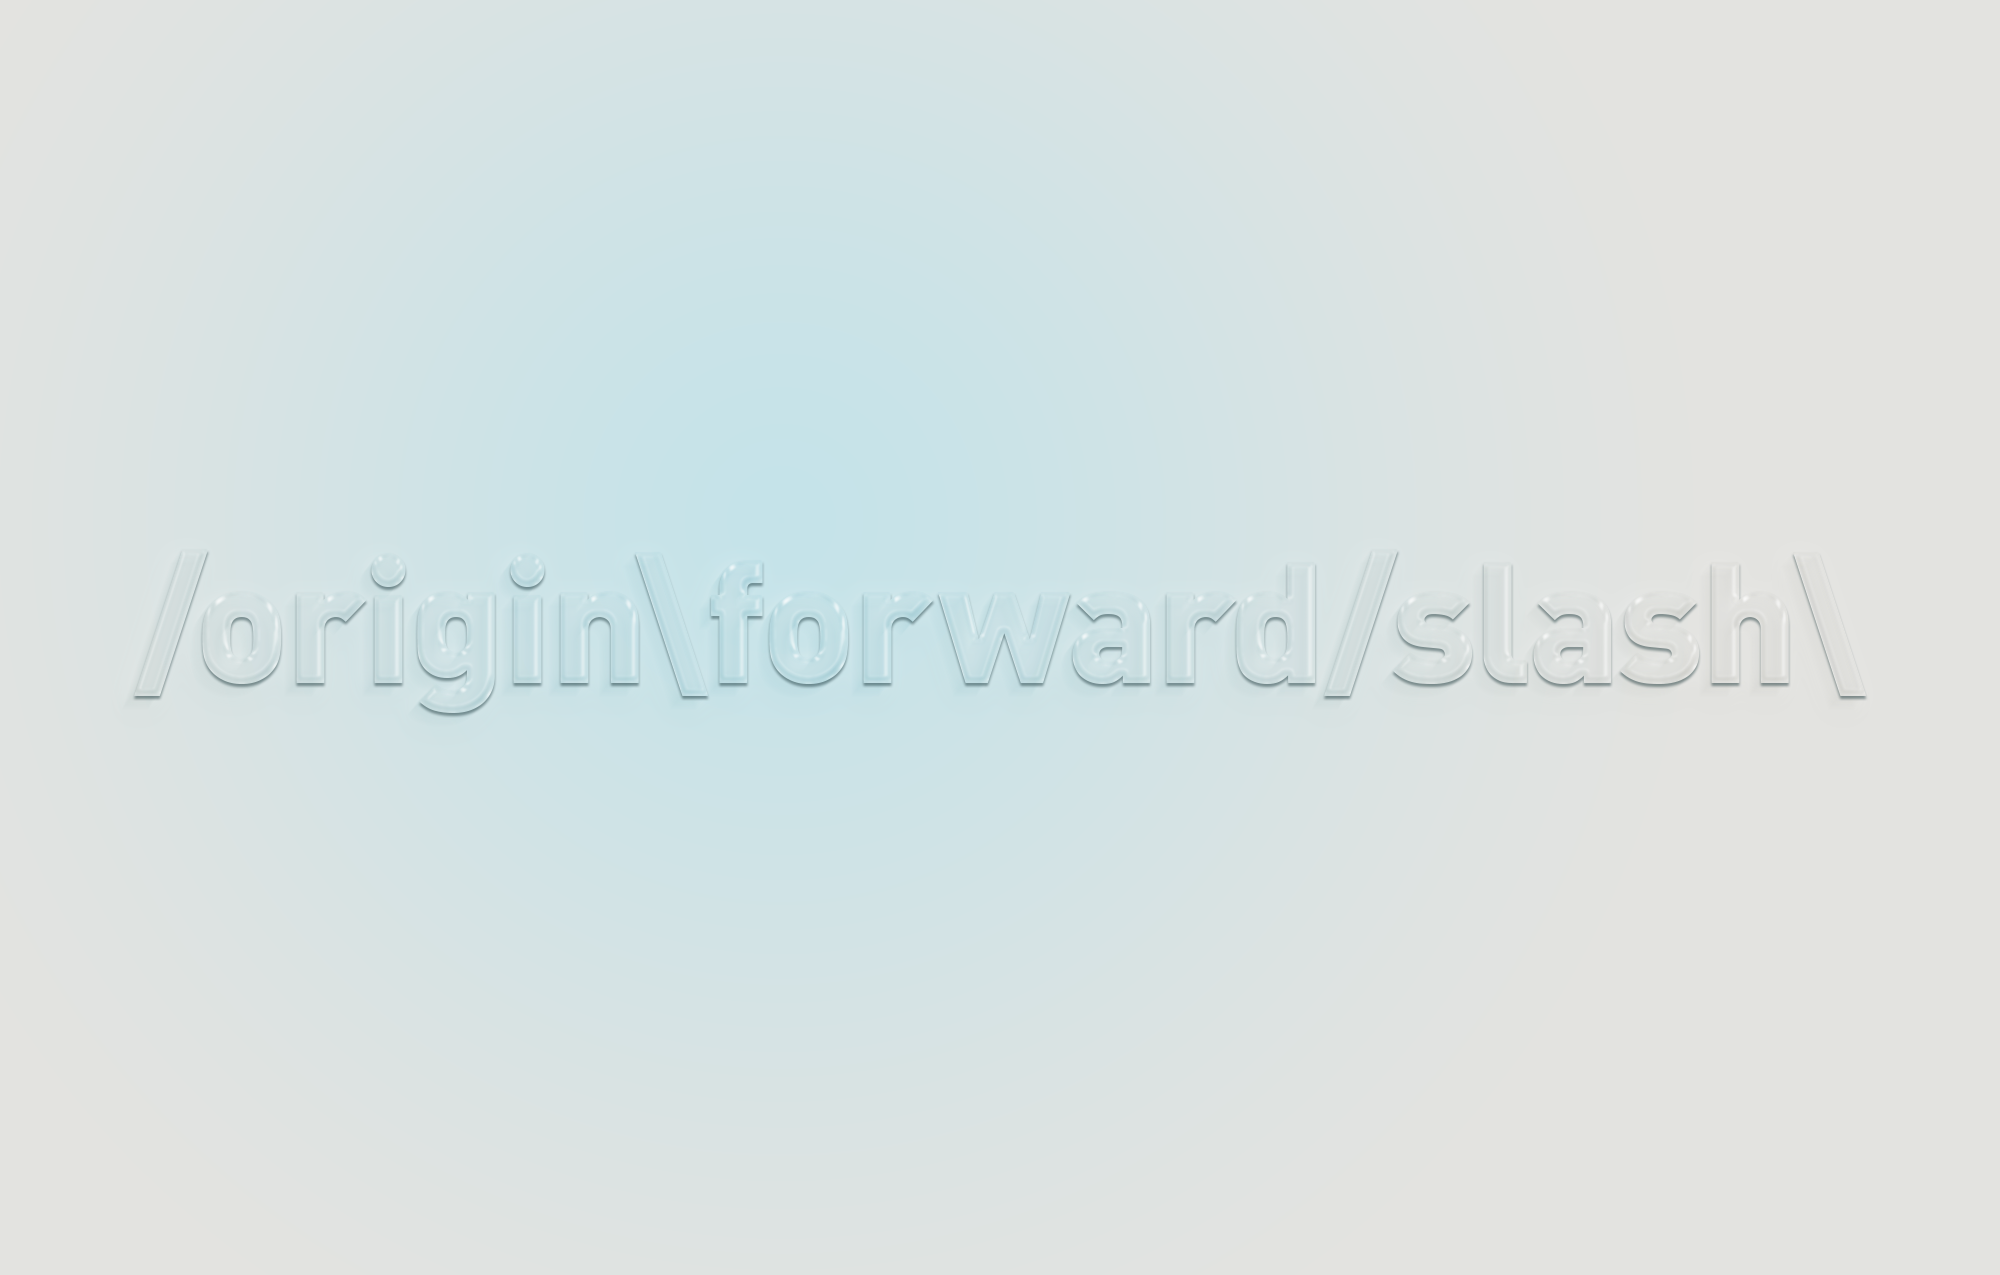 (/origin\forward/slash\ 0)